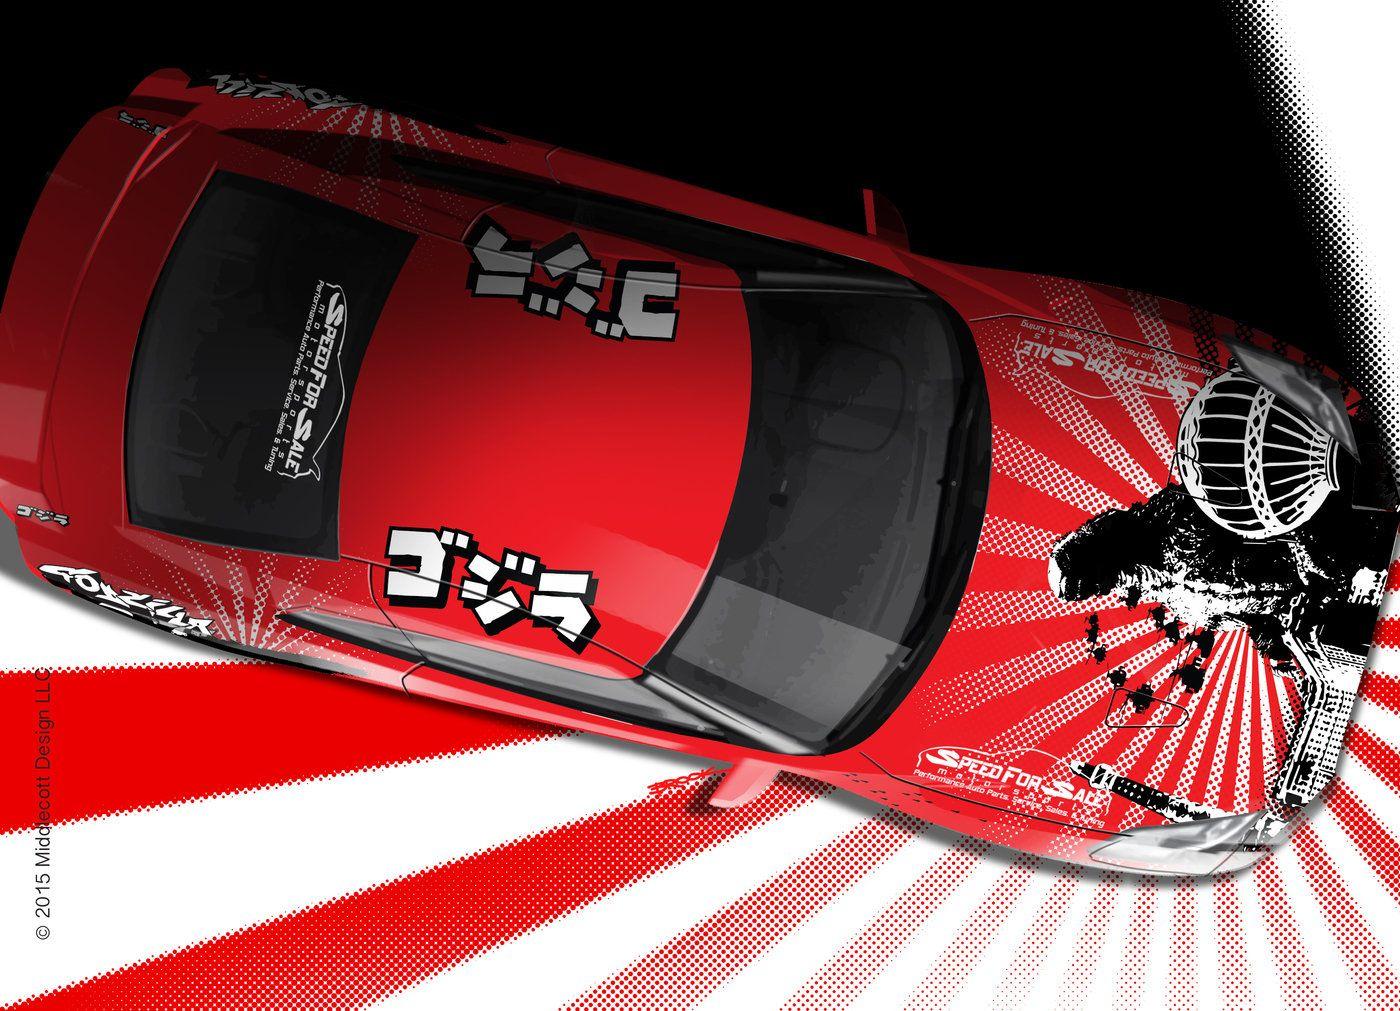 Godzilla Vs Las Vegas Vinyl Car Wrap Design By Brook Banham At Coroflot Com Car Wrap Car Wrap Design Godzilla Vs [ 1011 x 1400 Pixel ]